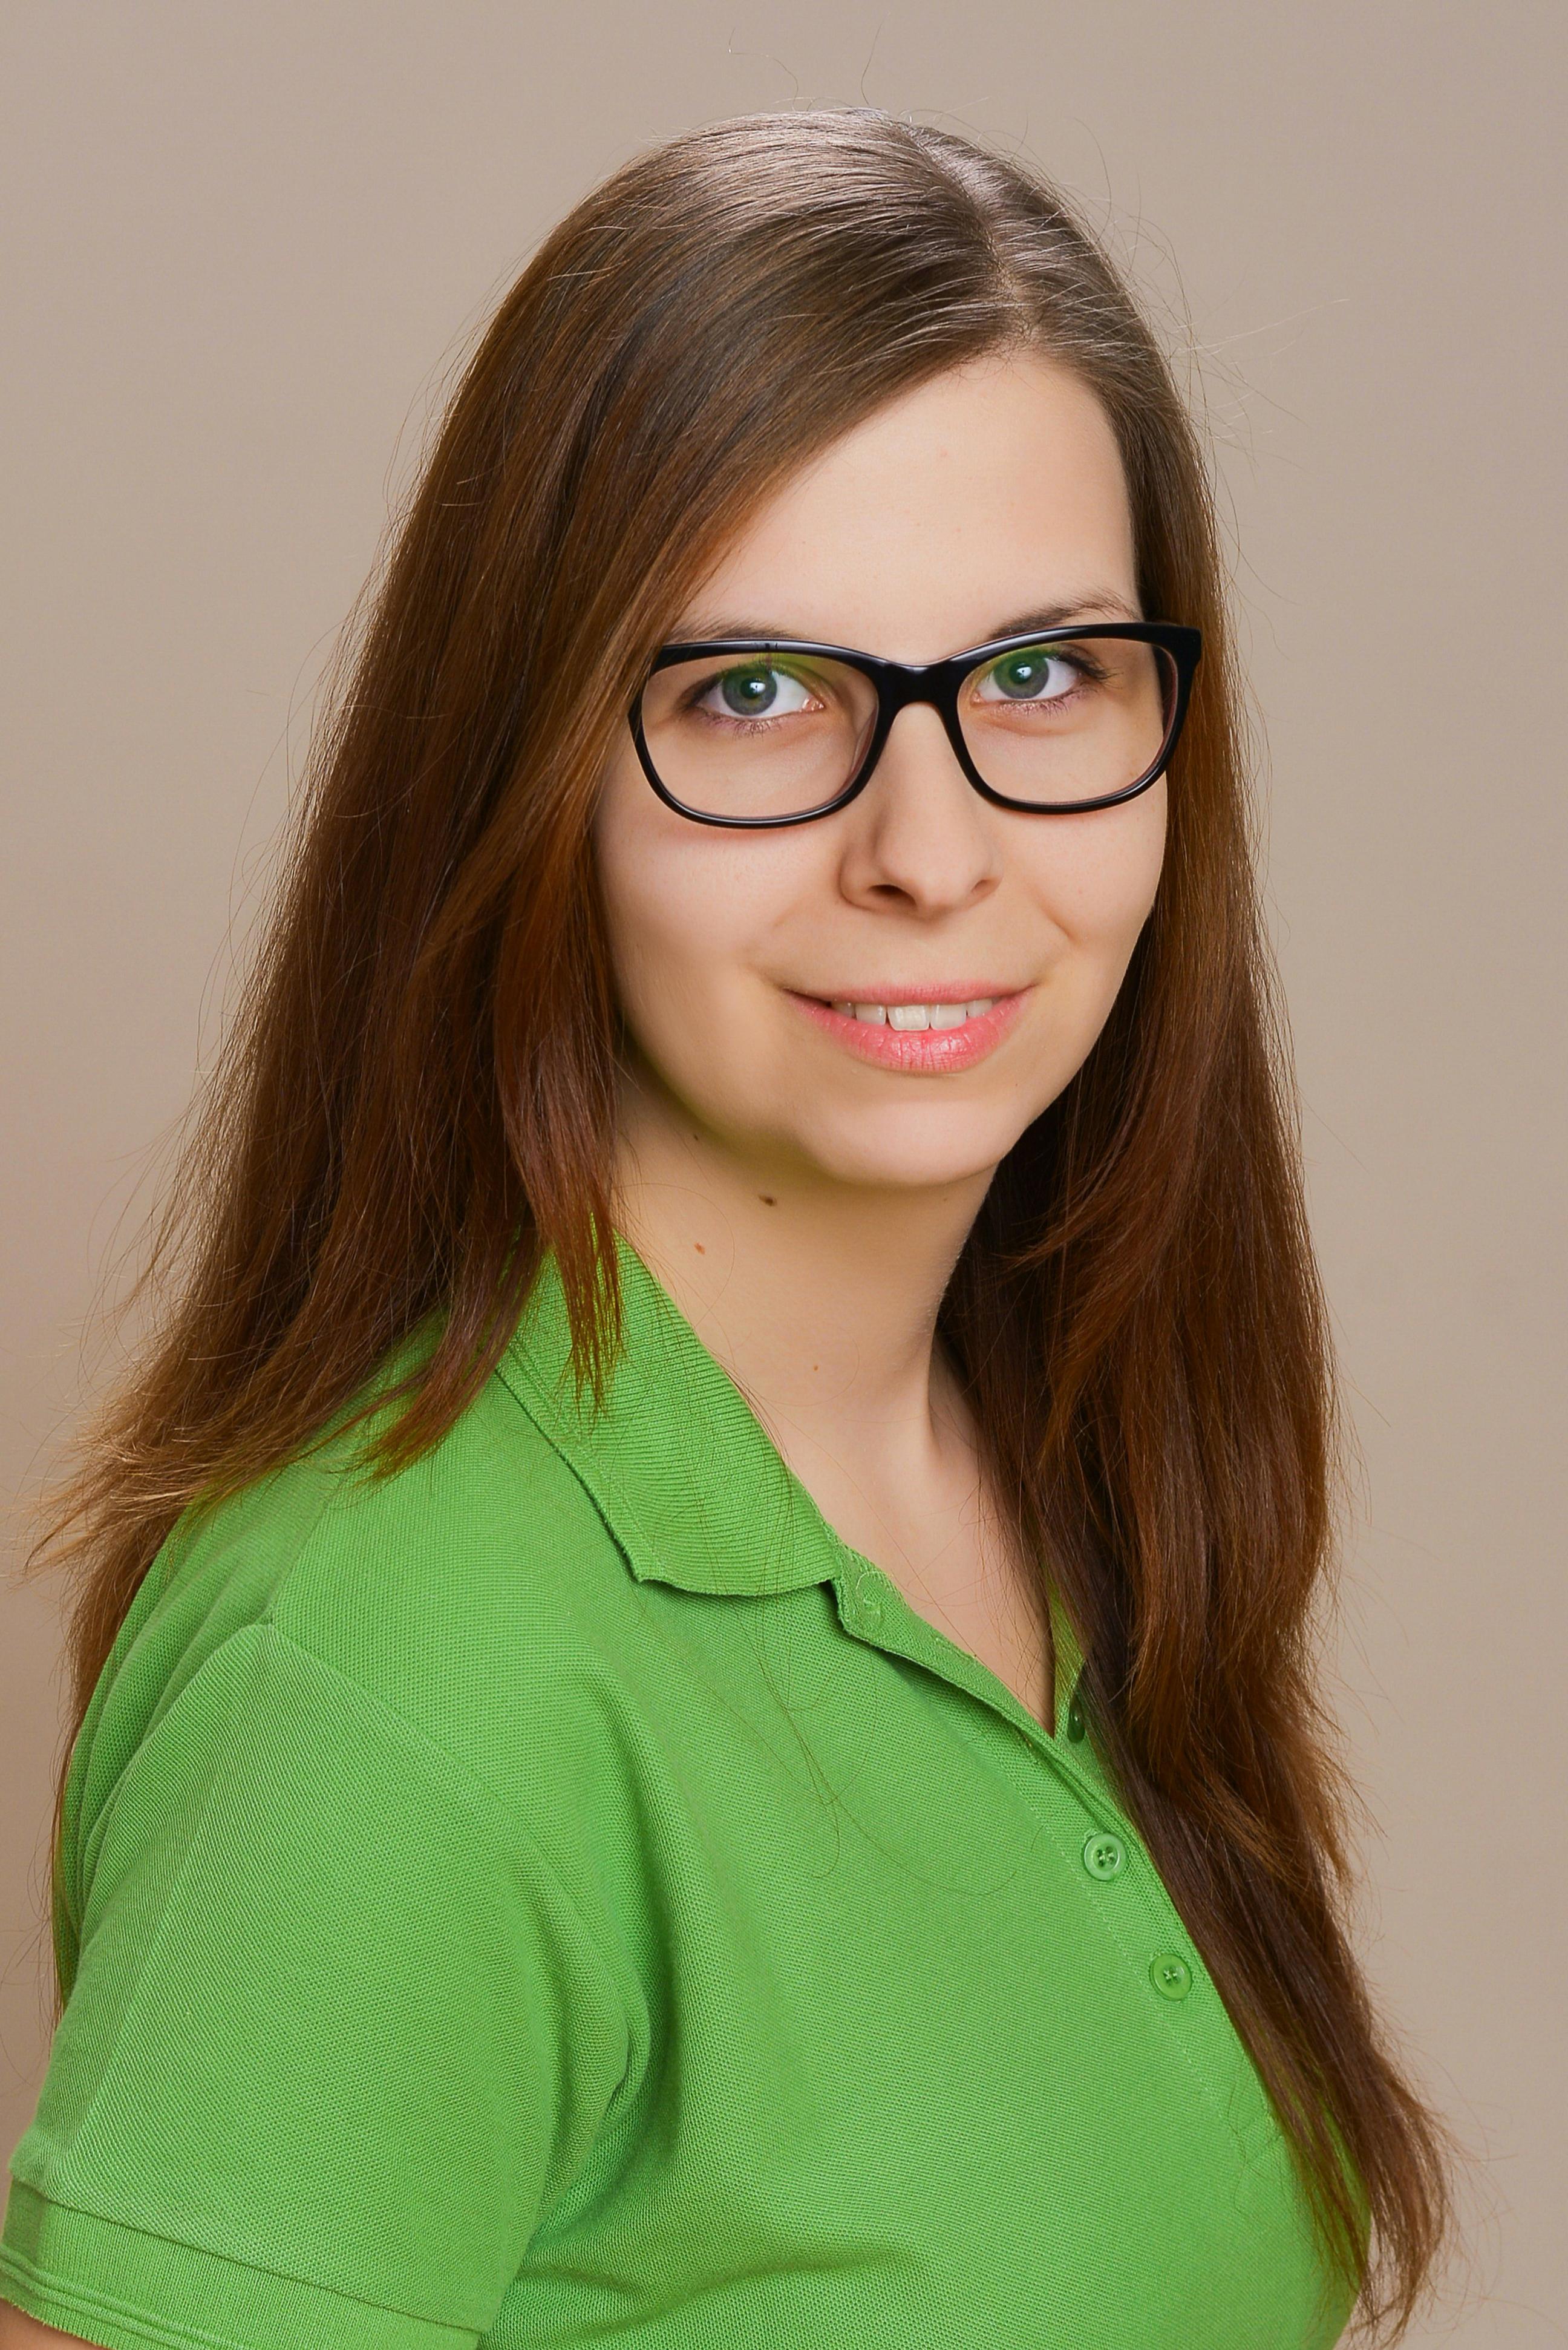 Szabó Dorottya - Óvodapedagógus